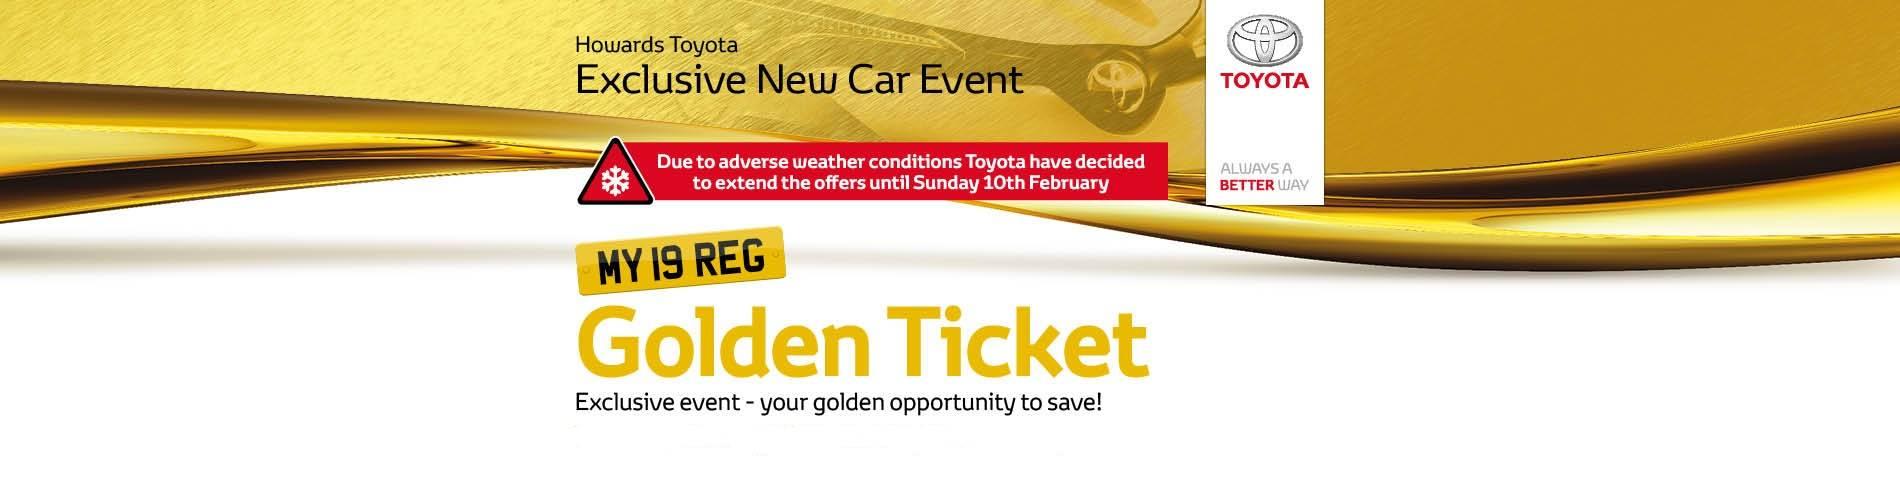 Citroen Golden Ticket